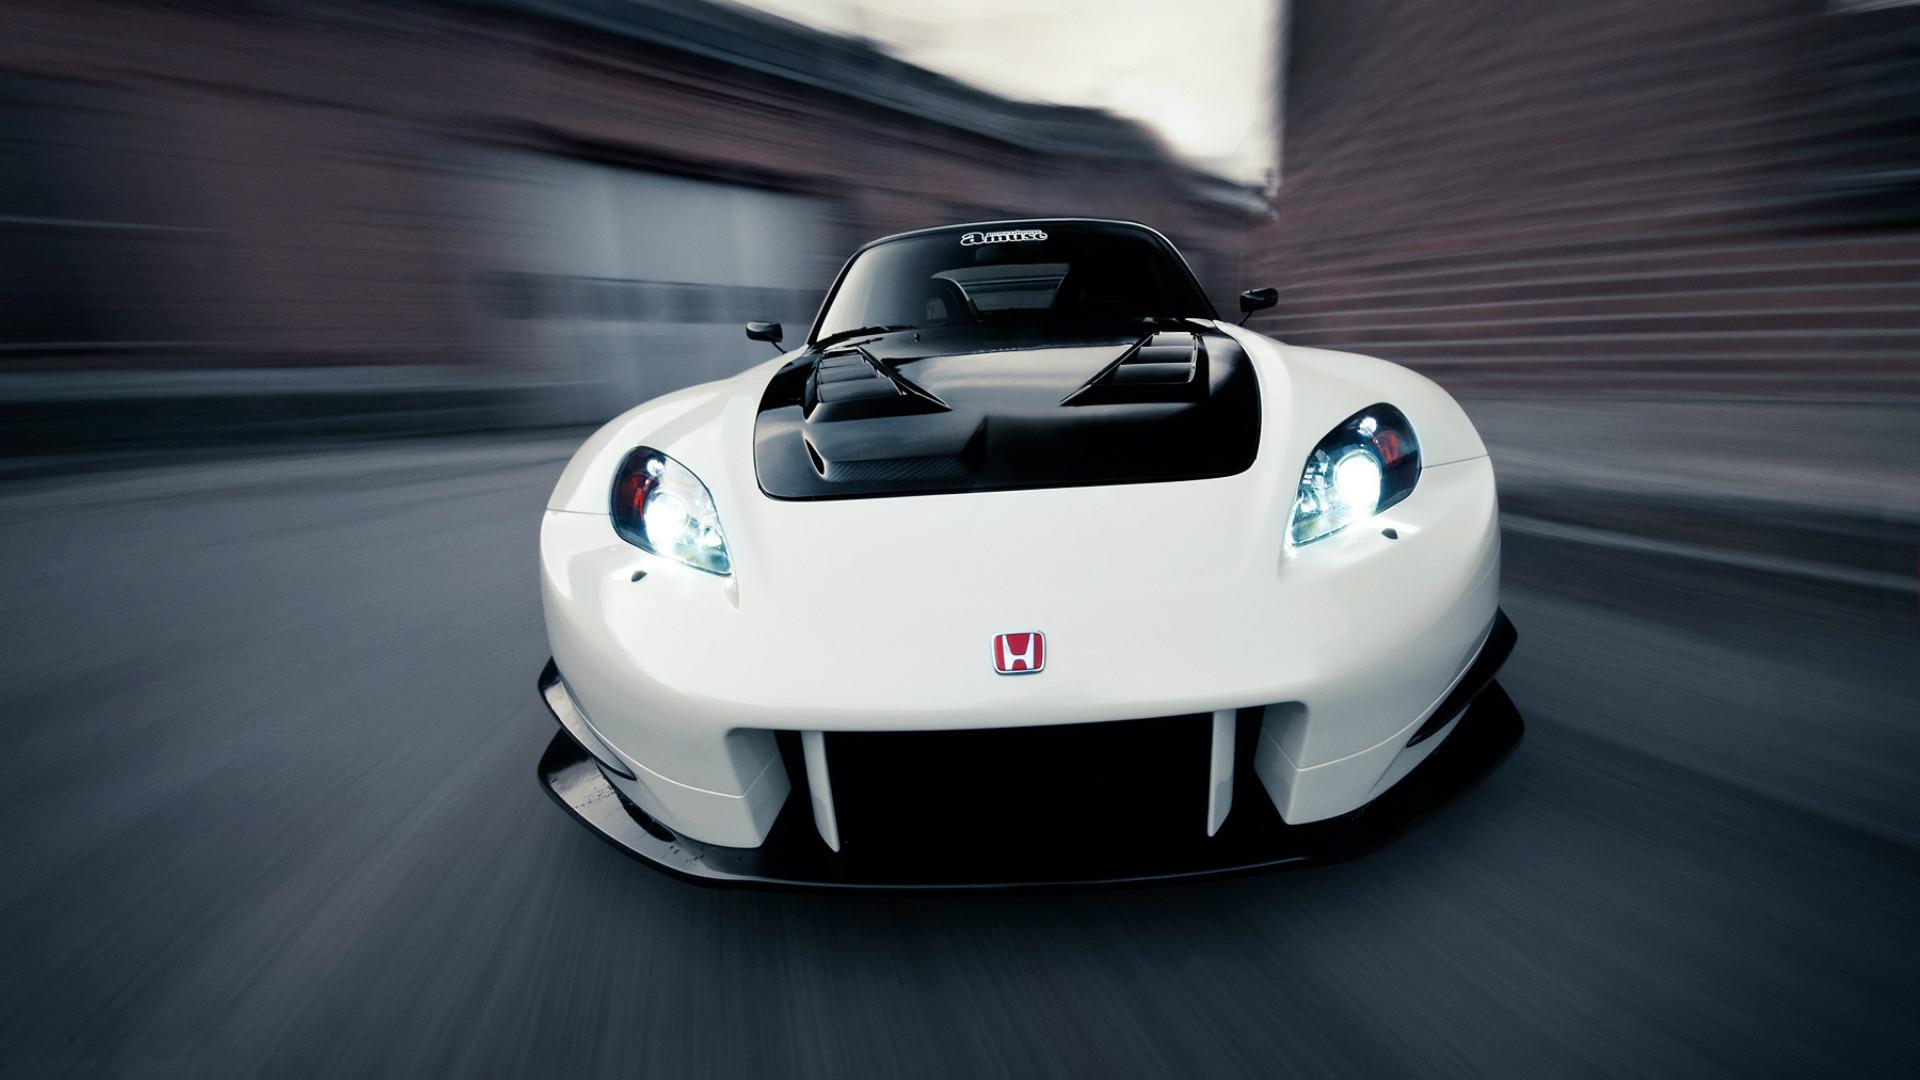 Res: 1920x1080, honda s2000, honda, roadster, luxury, sports car, speed